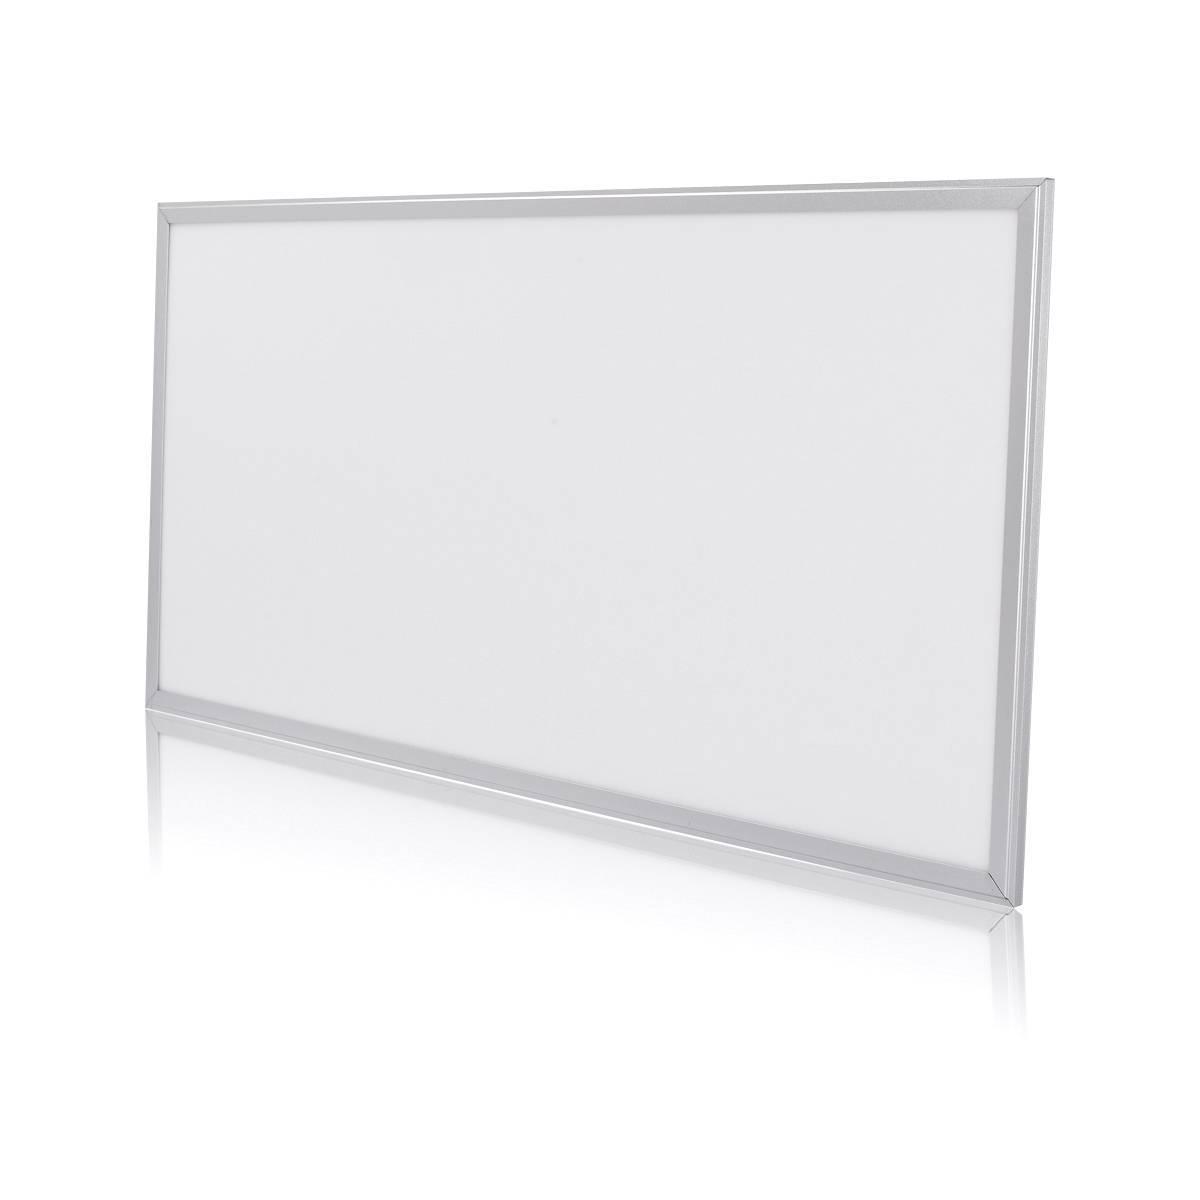 6001200 80W LED panel light